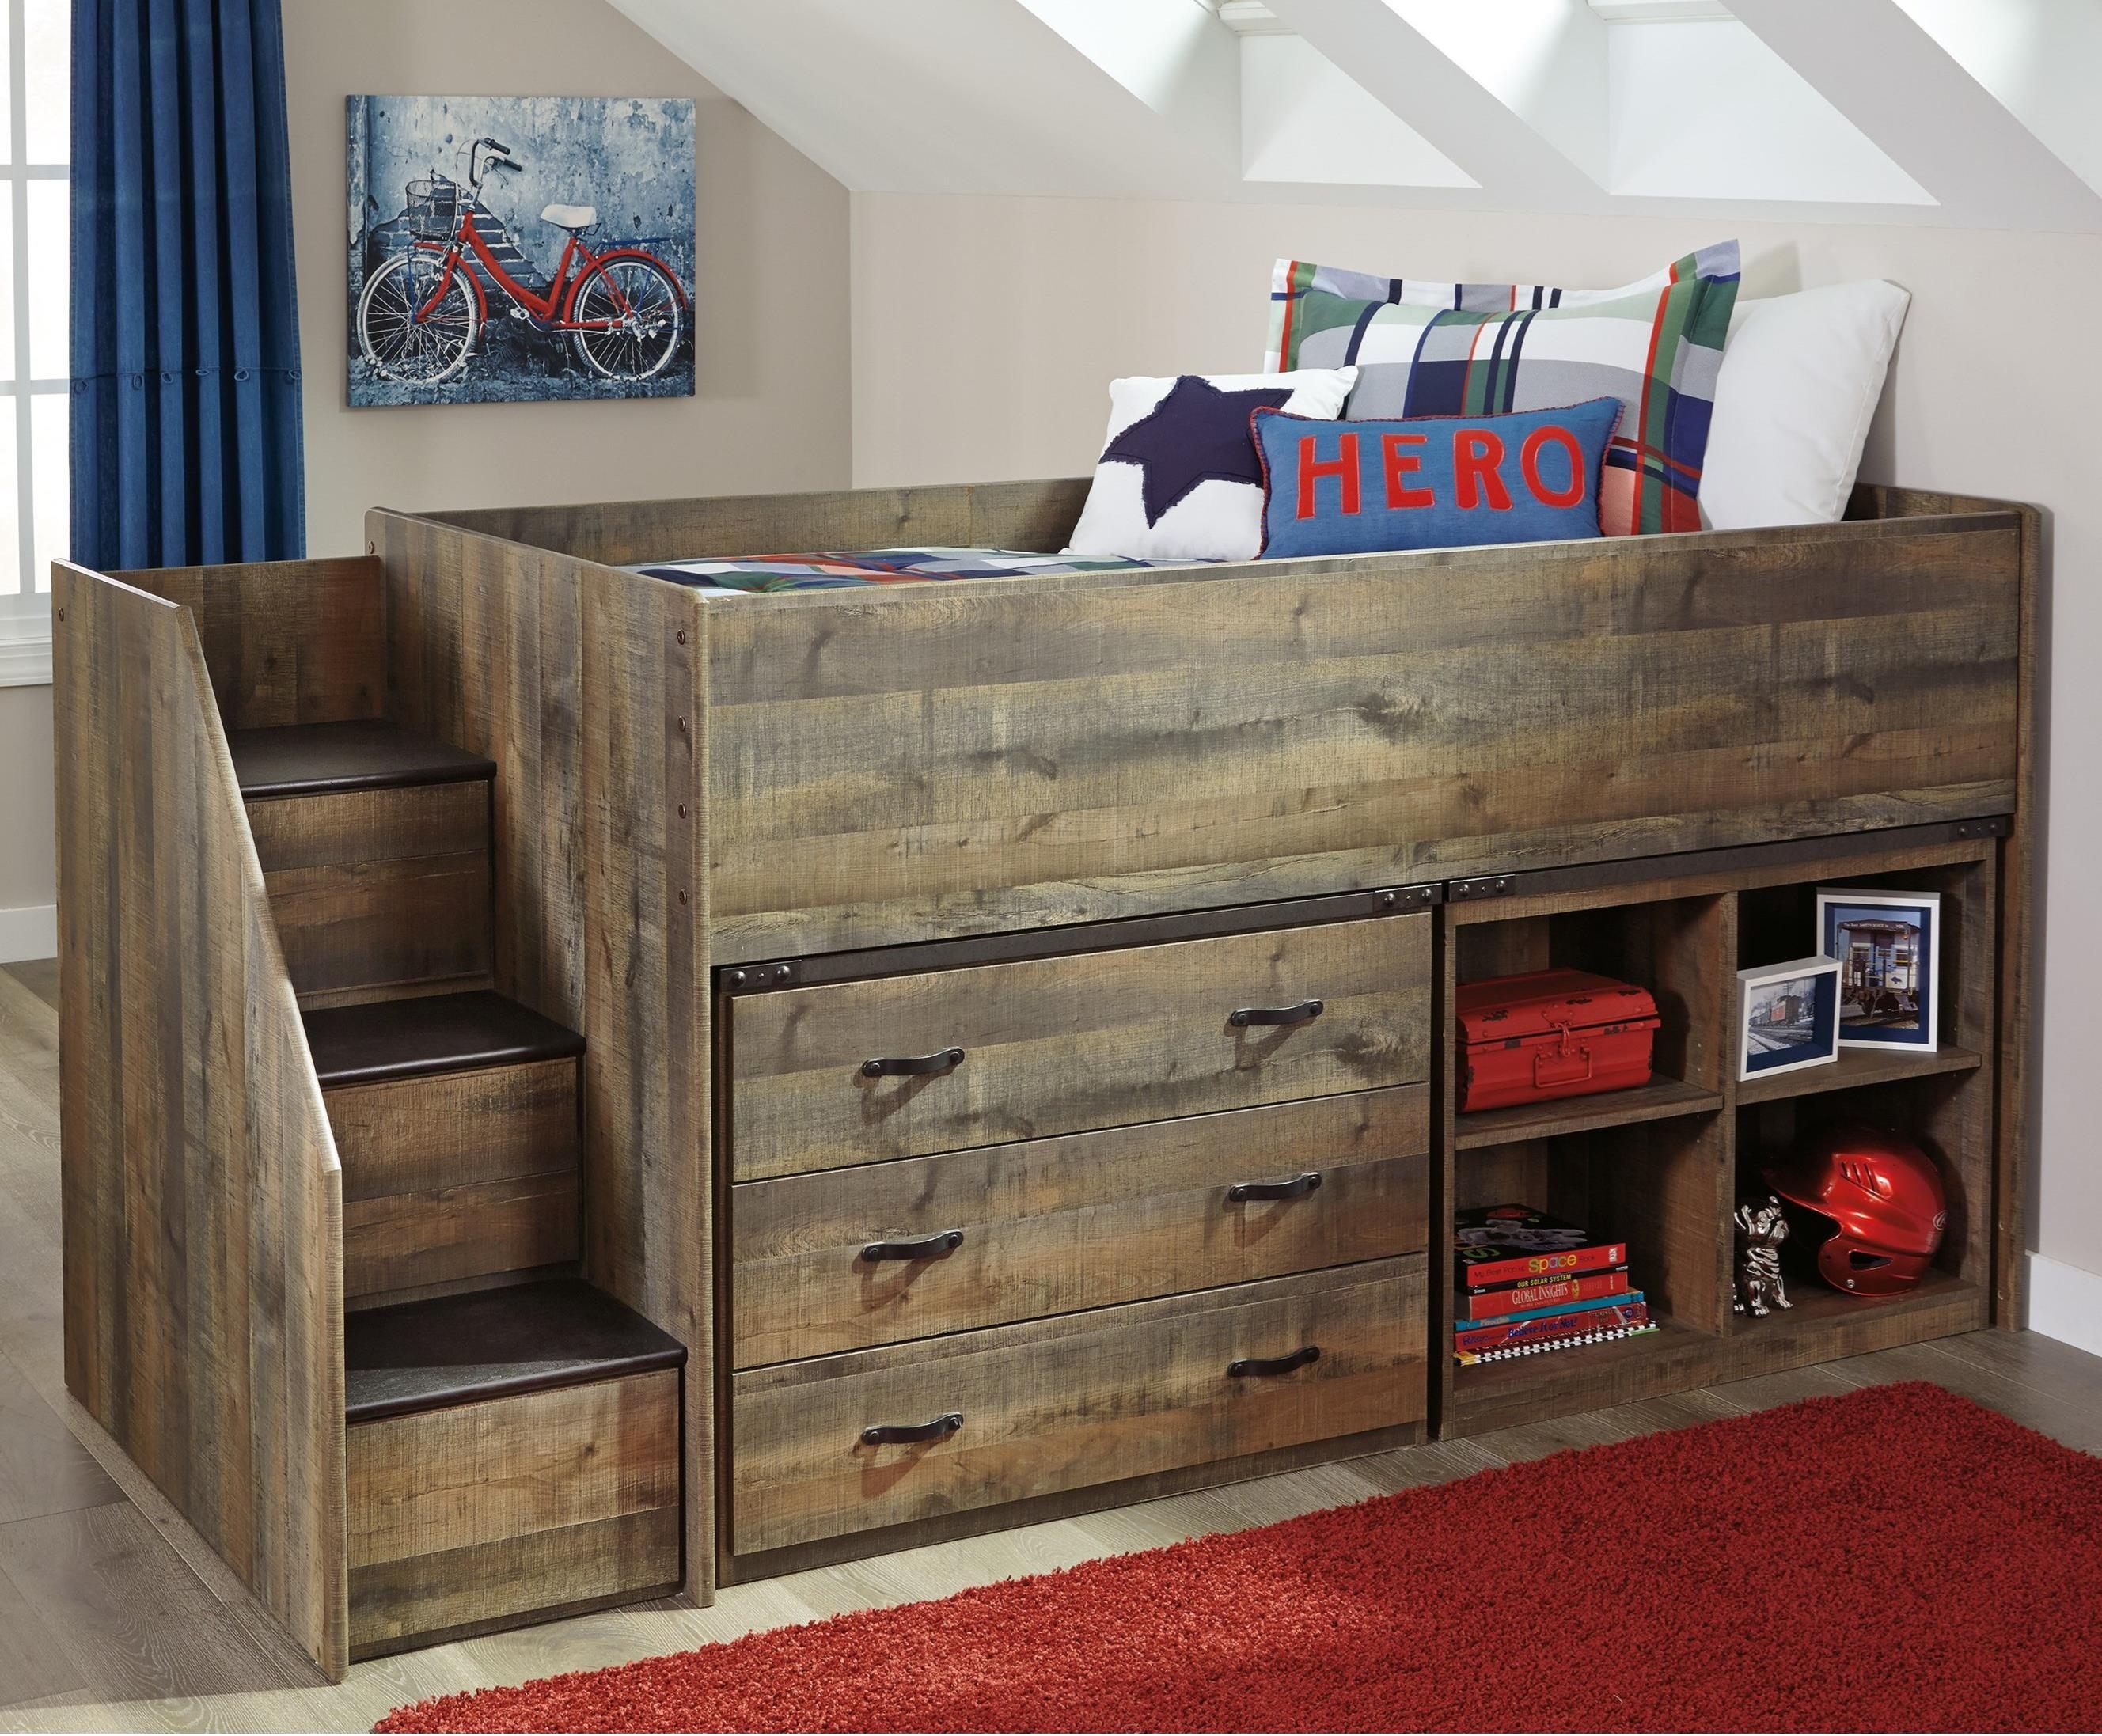 Signature Design By Ashley Trinell Loft Bed W/ Stairs, Bookcase, U0026 Drawer  Storage